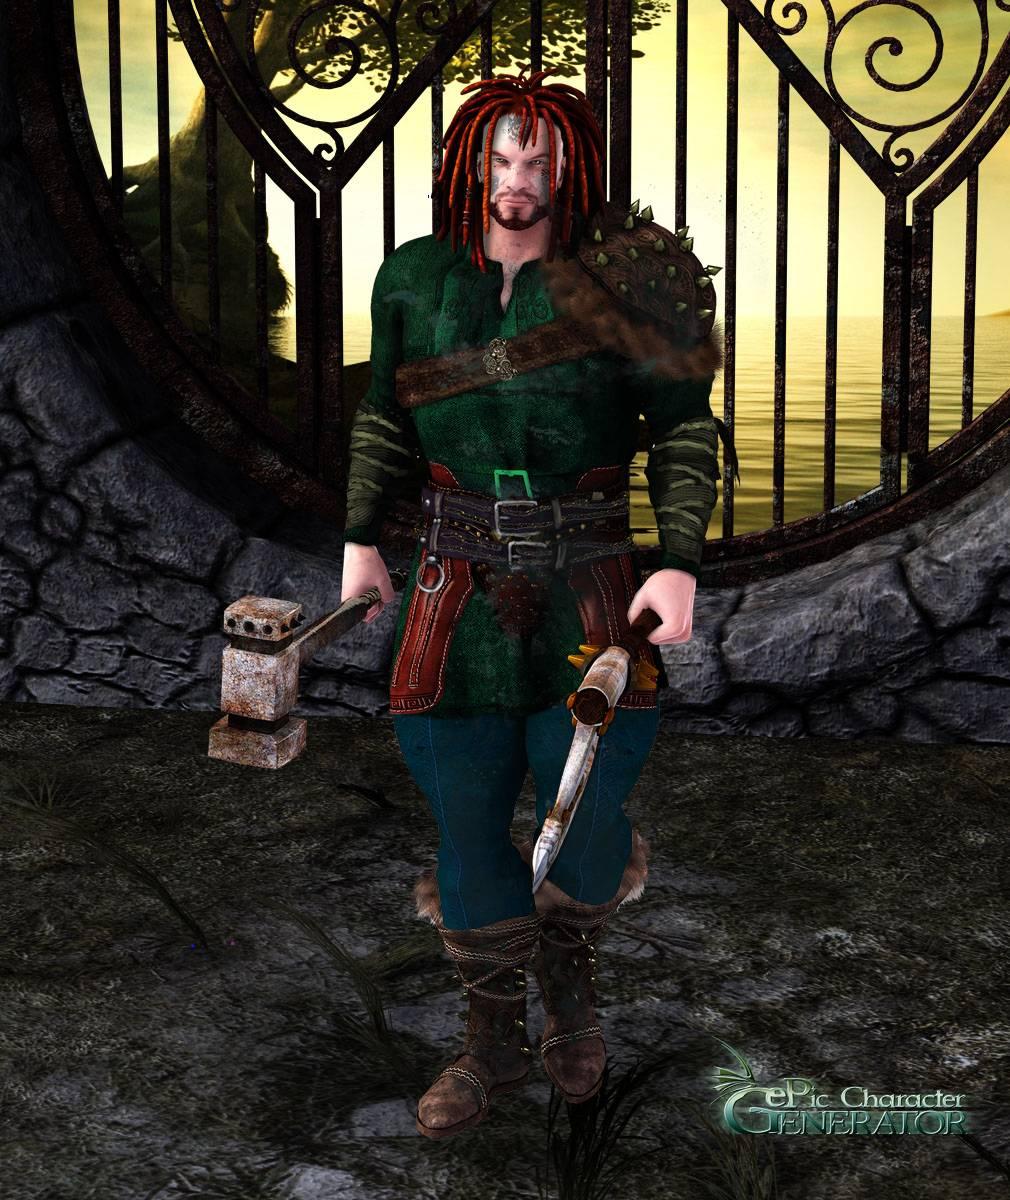 ePic Character Generator Season 2 Muscular Barbarian Screenshot 07